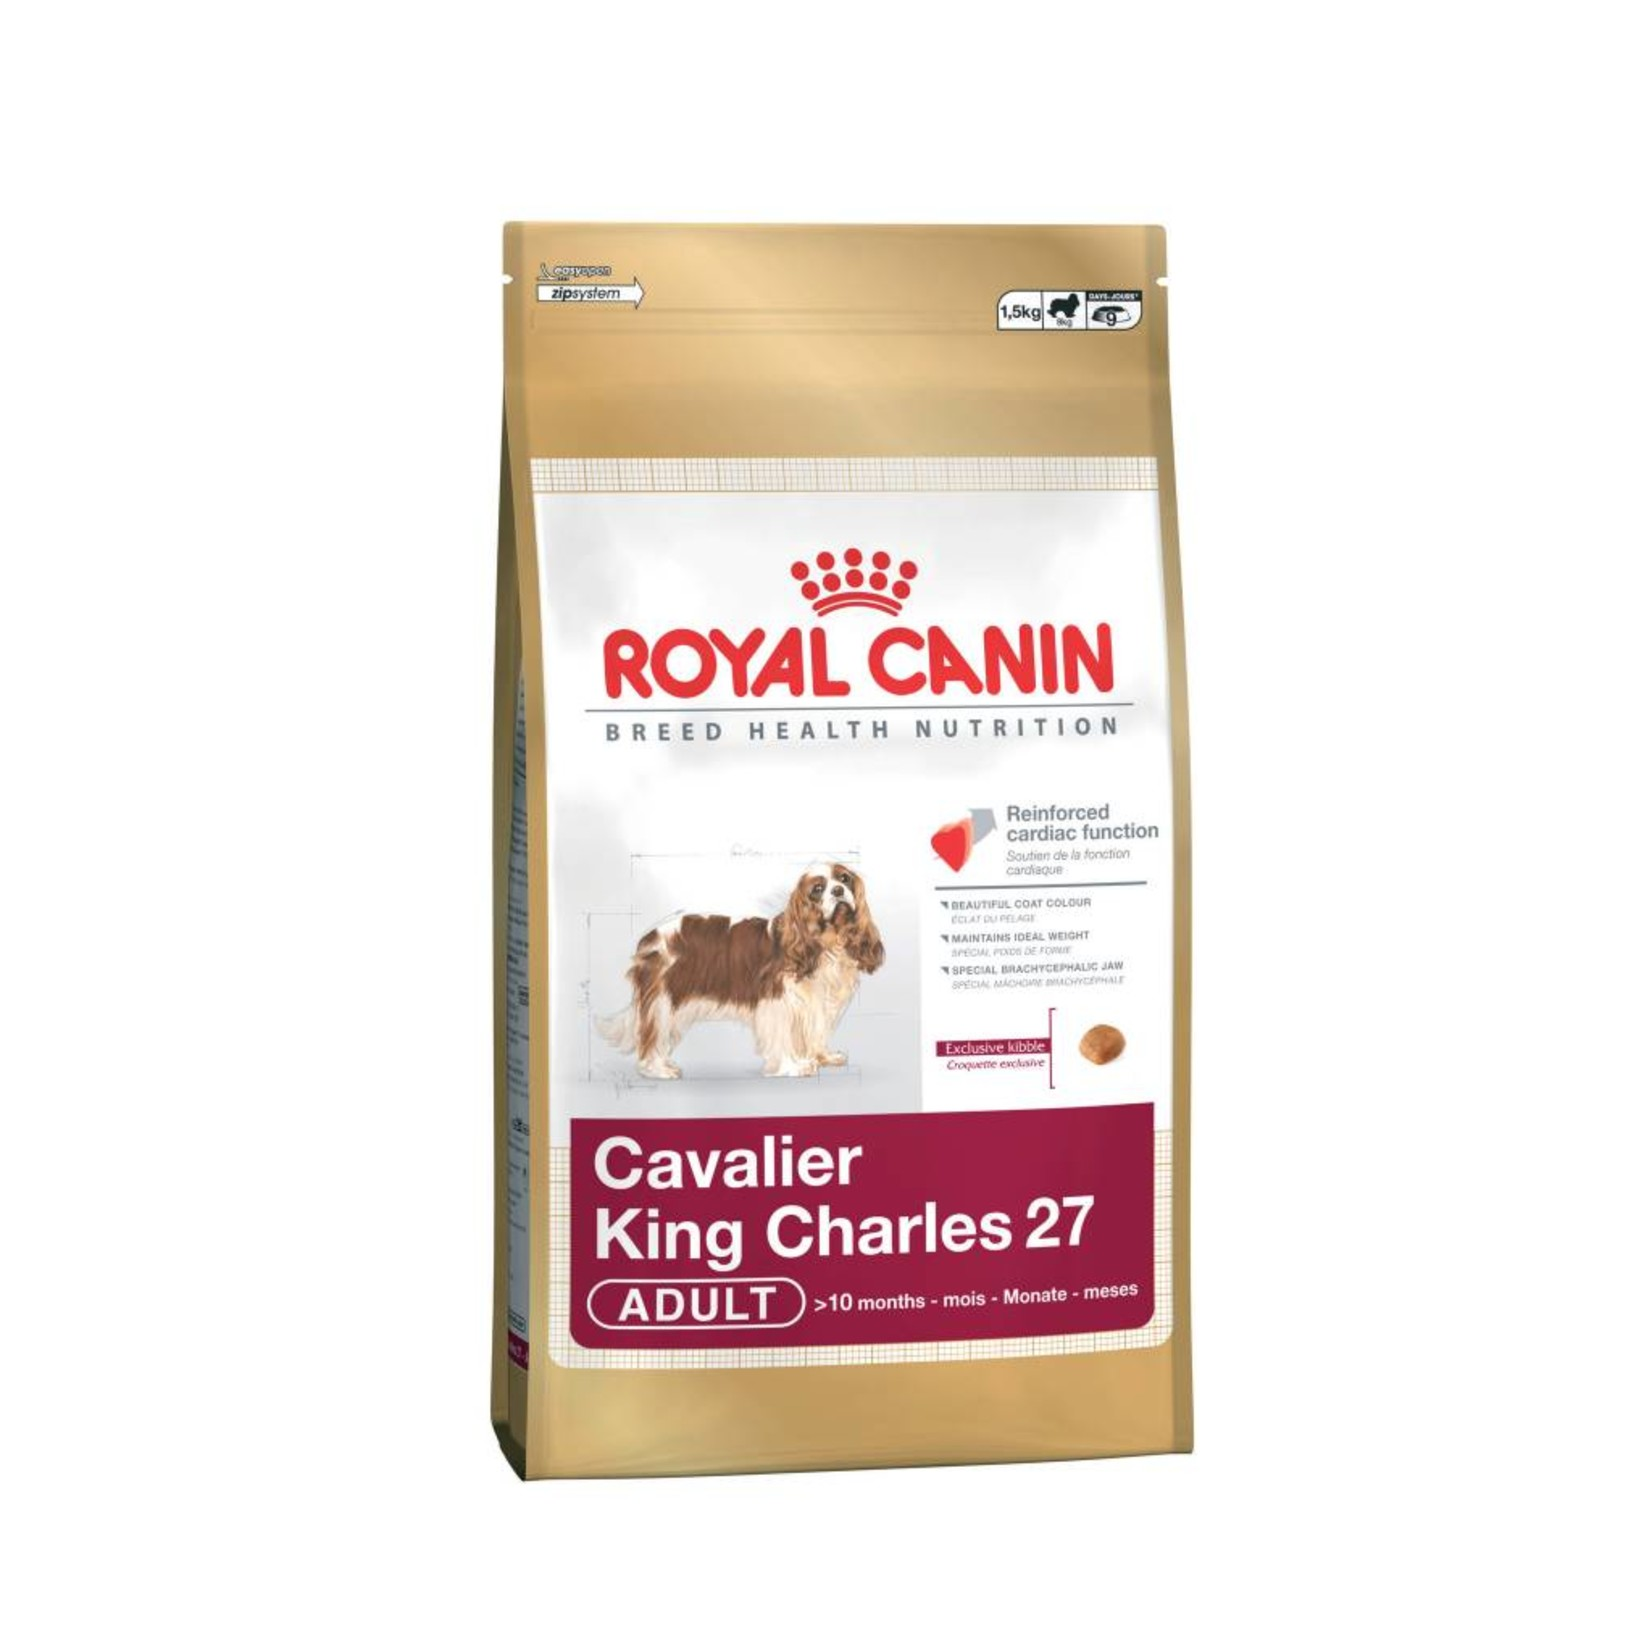 Royal Canin Cavalier King Charles Adult Dog Dry Food